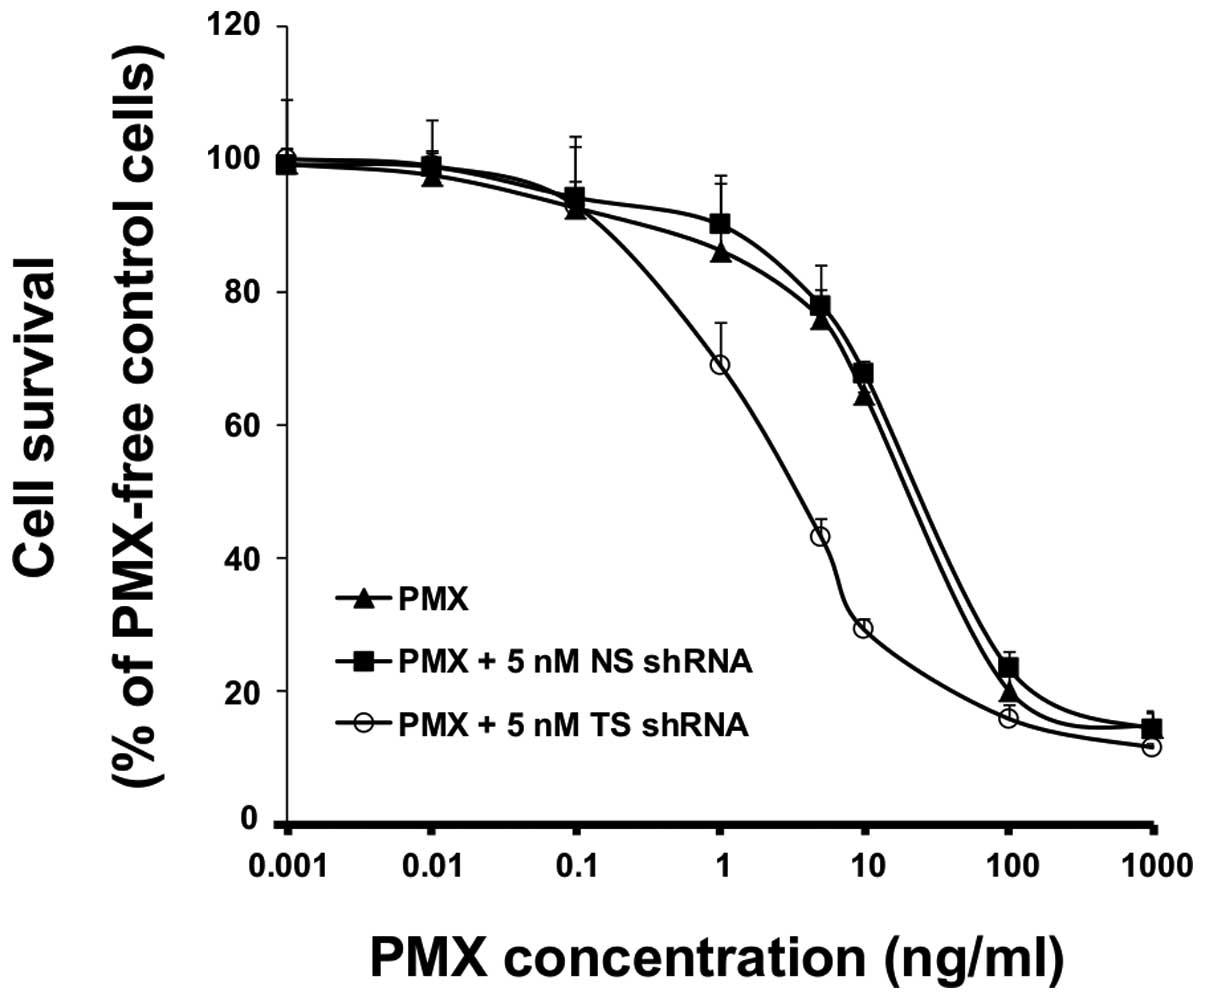 Downregulation of thymidylate synthase by RNAi molecules enhances